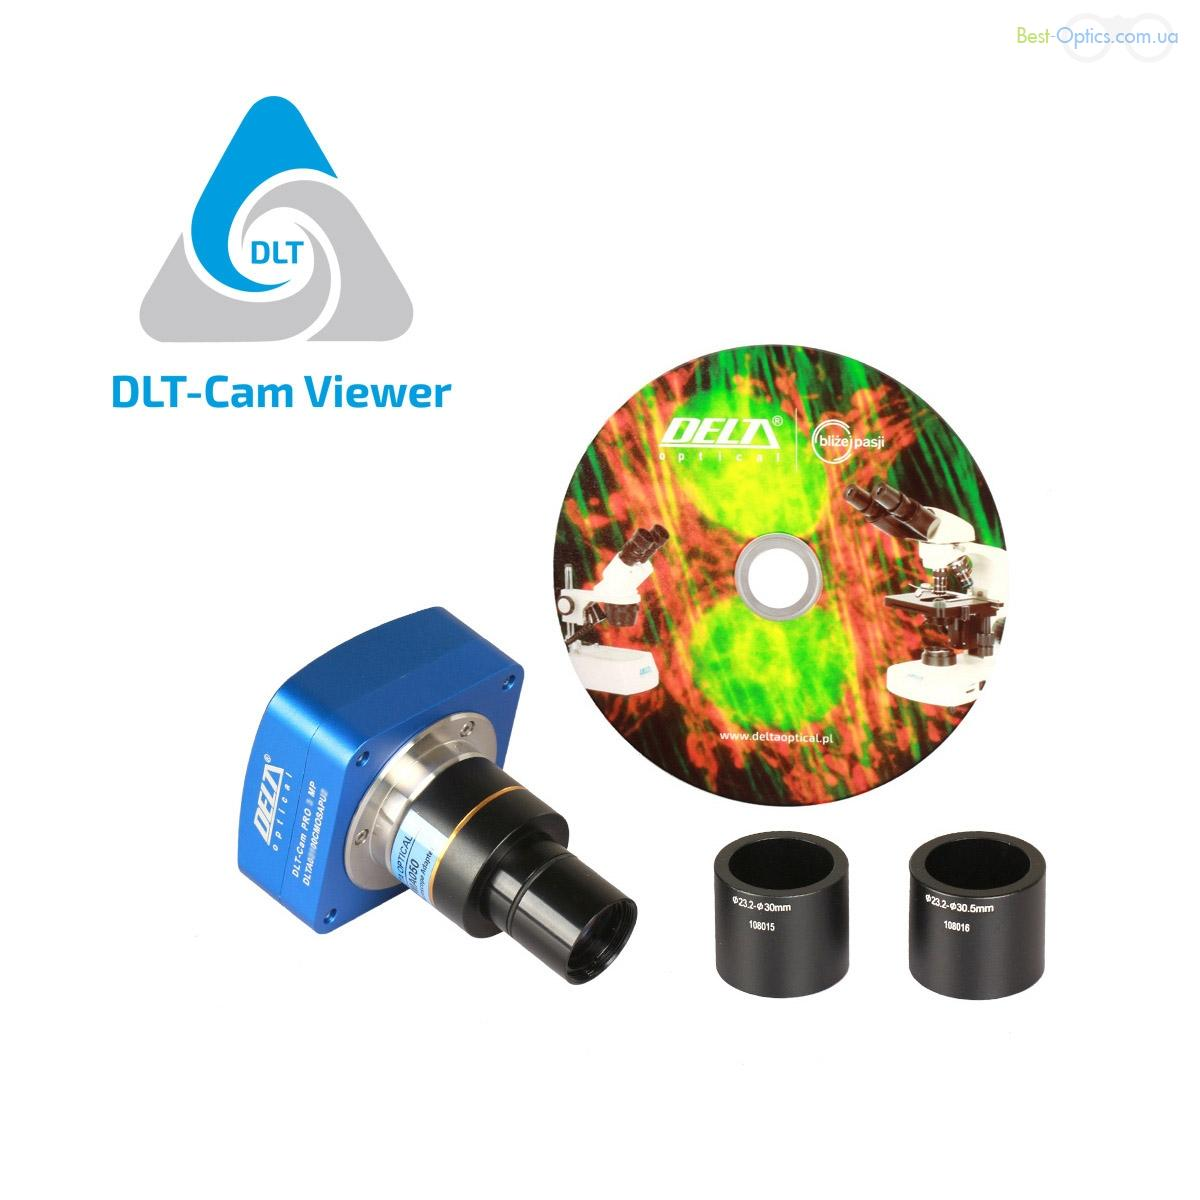 Цифровая камера Delta Optical DLT-Cam PRO 10MP USB 2.0